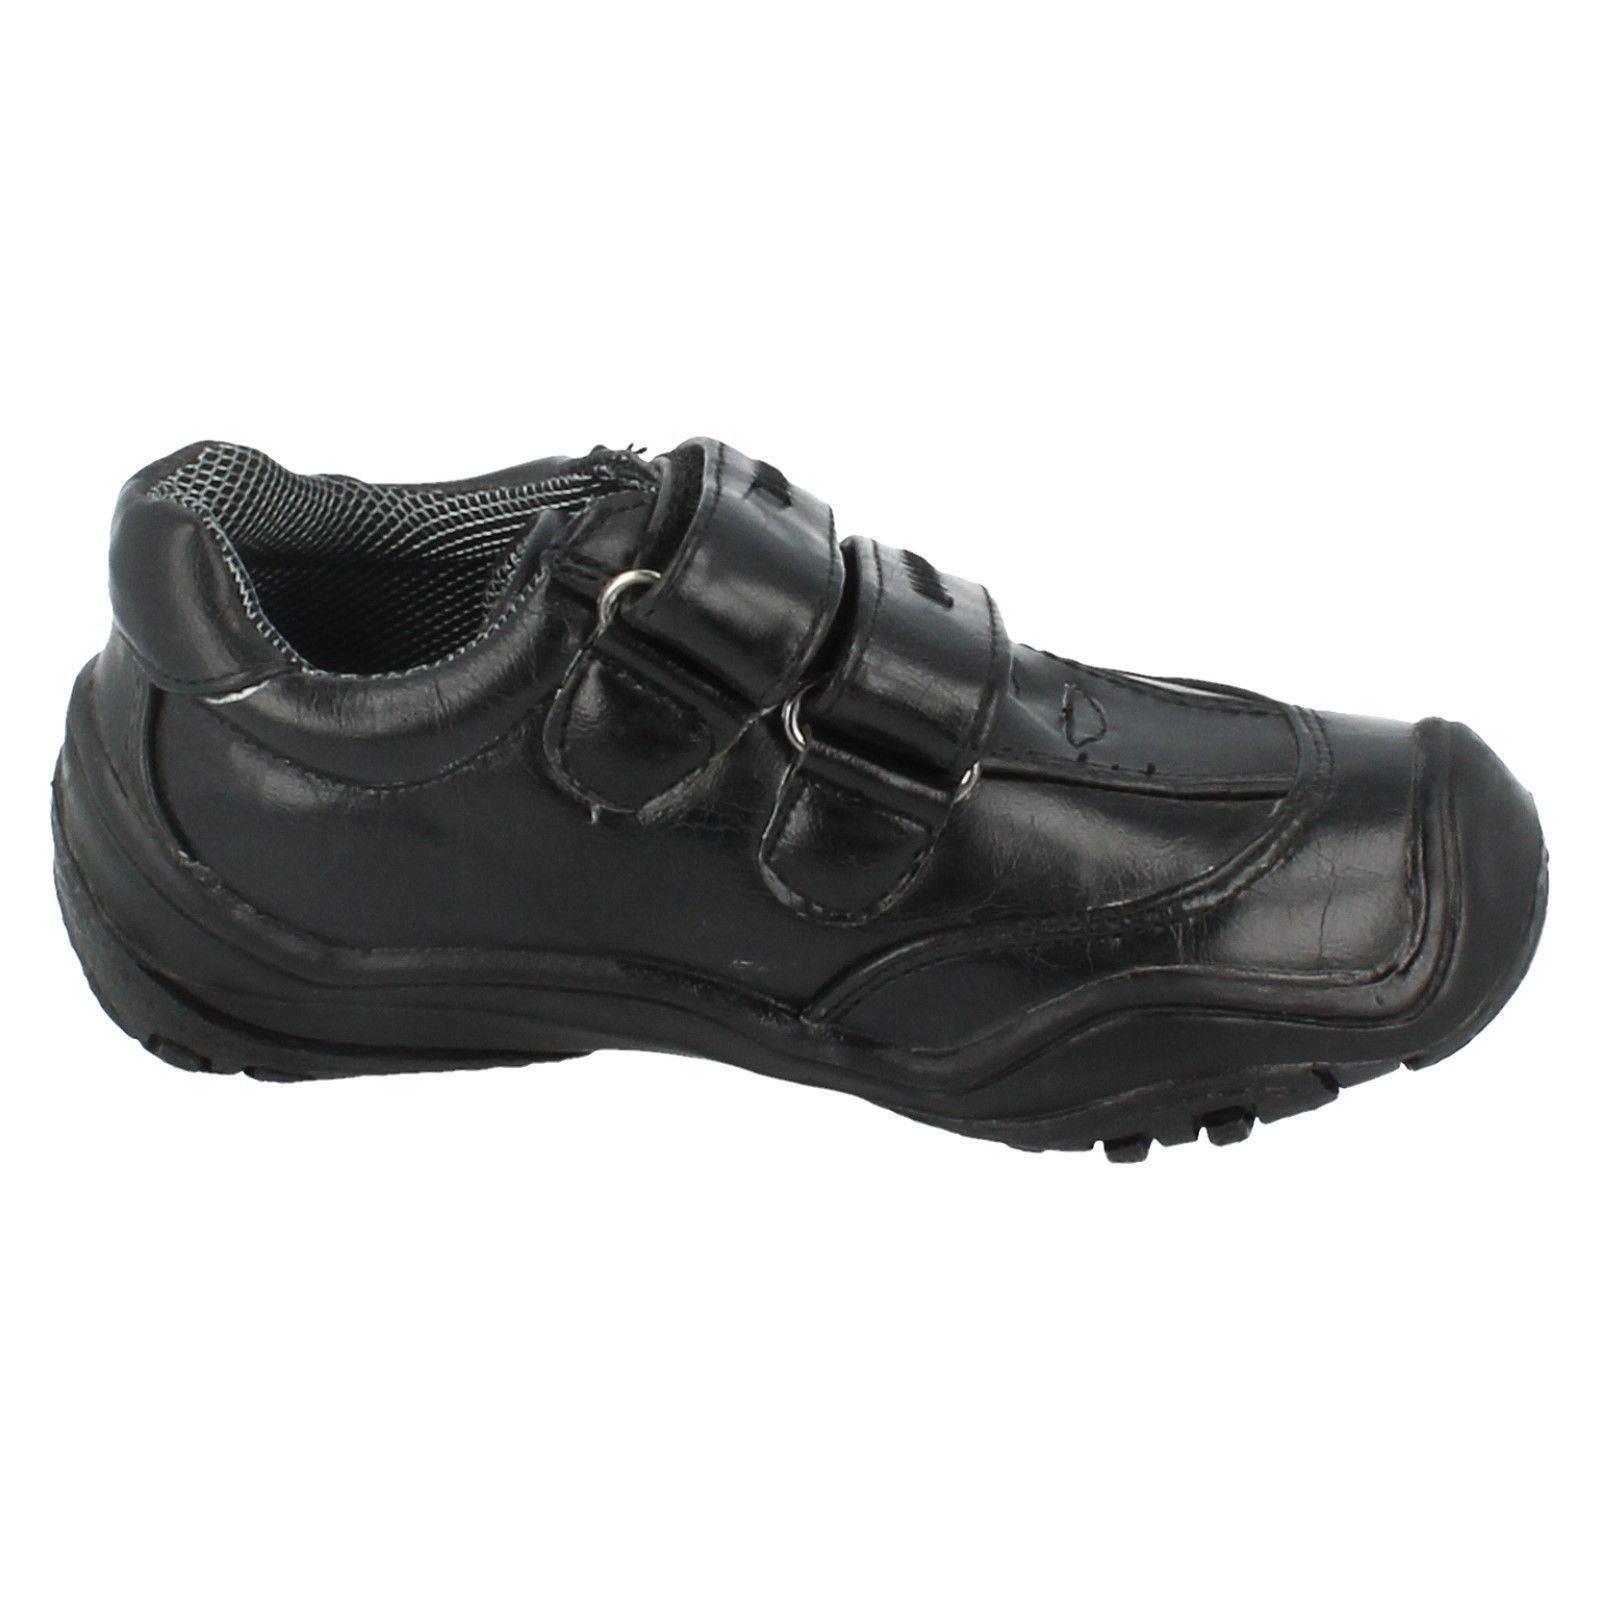 Childs Cutie H2189 Informal Zapatos/Entrenadores Etiqueta ~ K